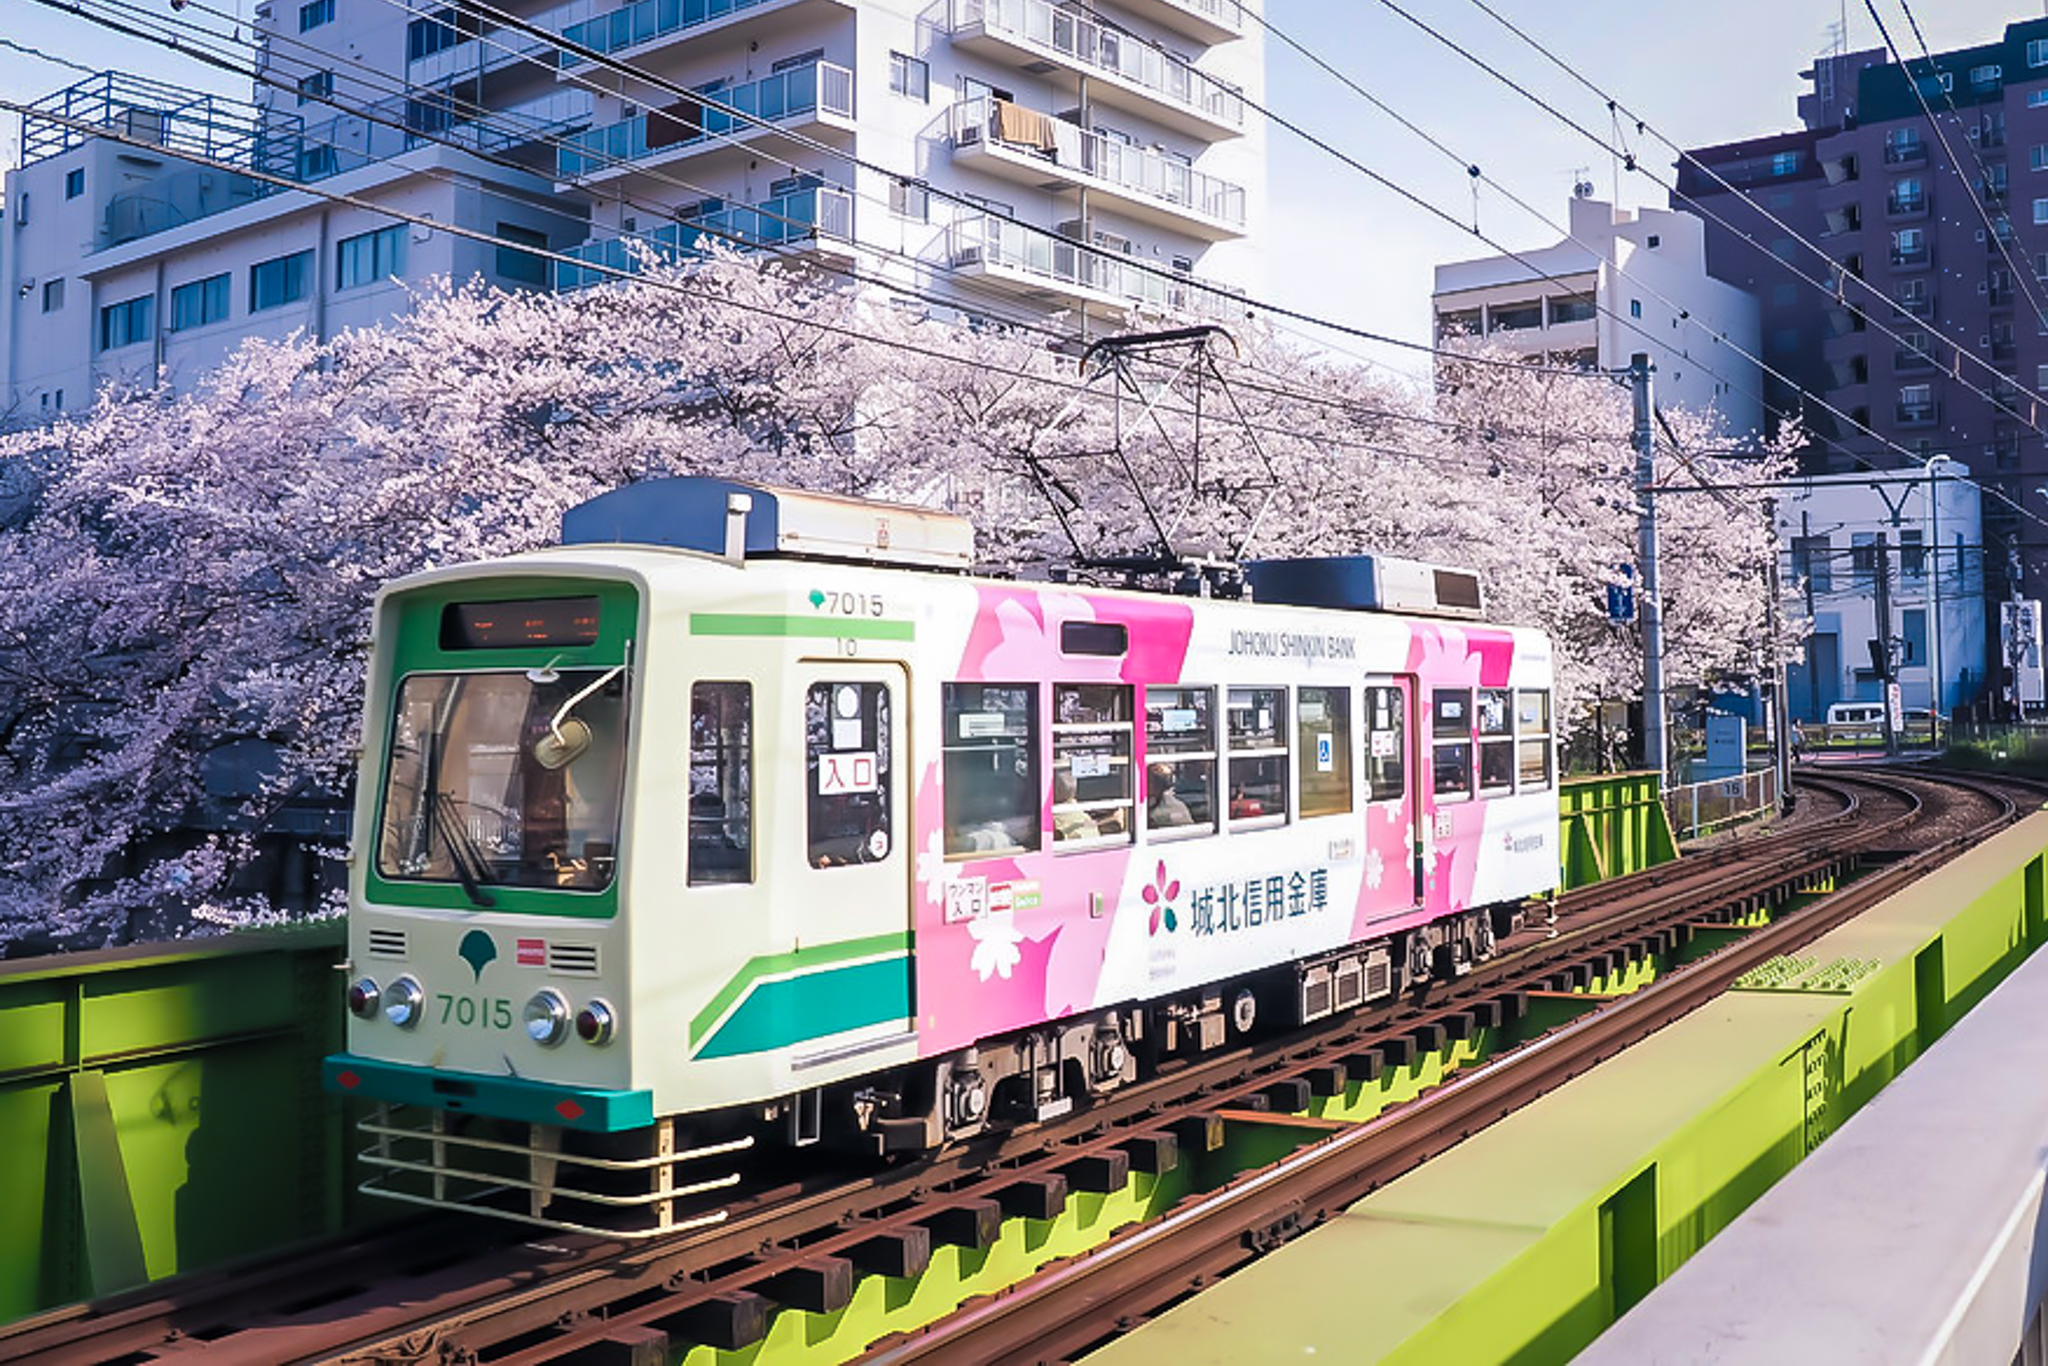 Take the scenic tram line